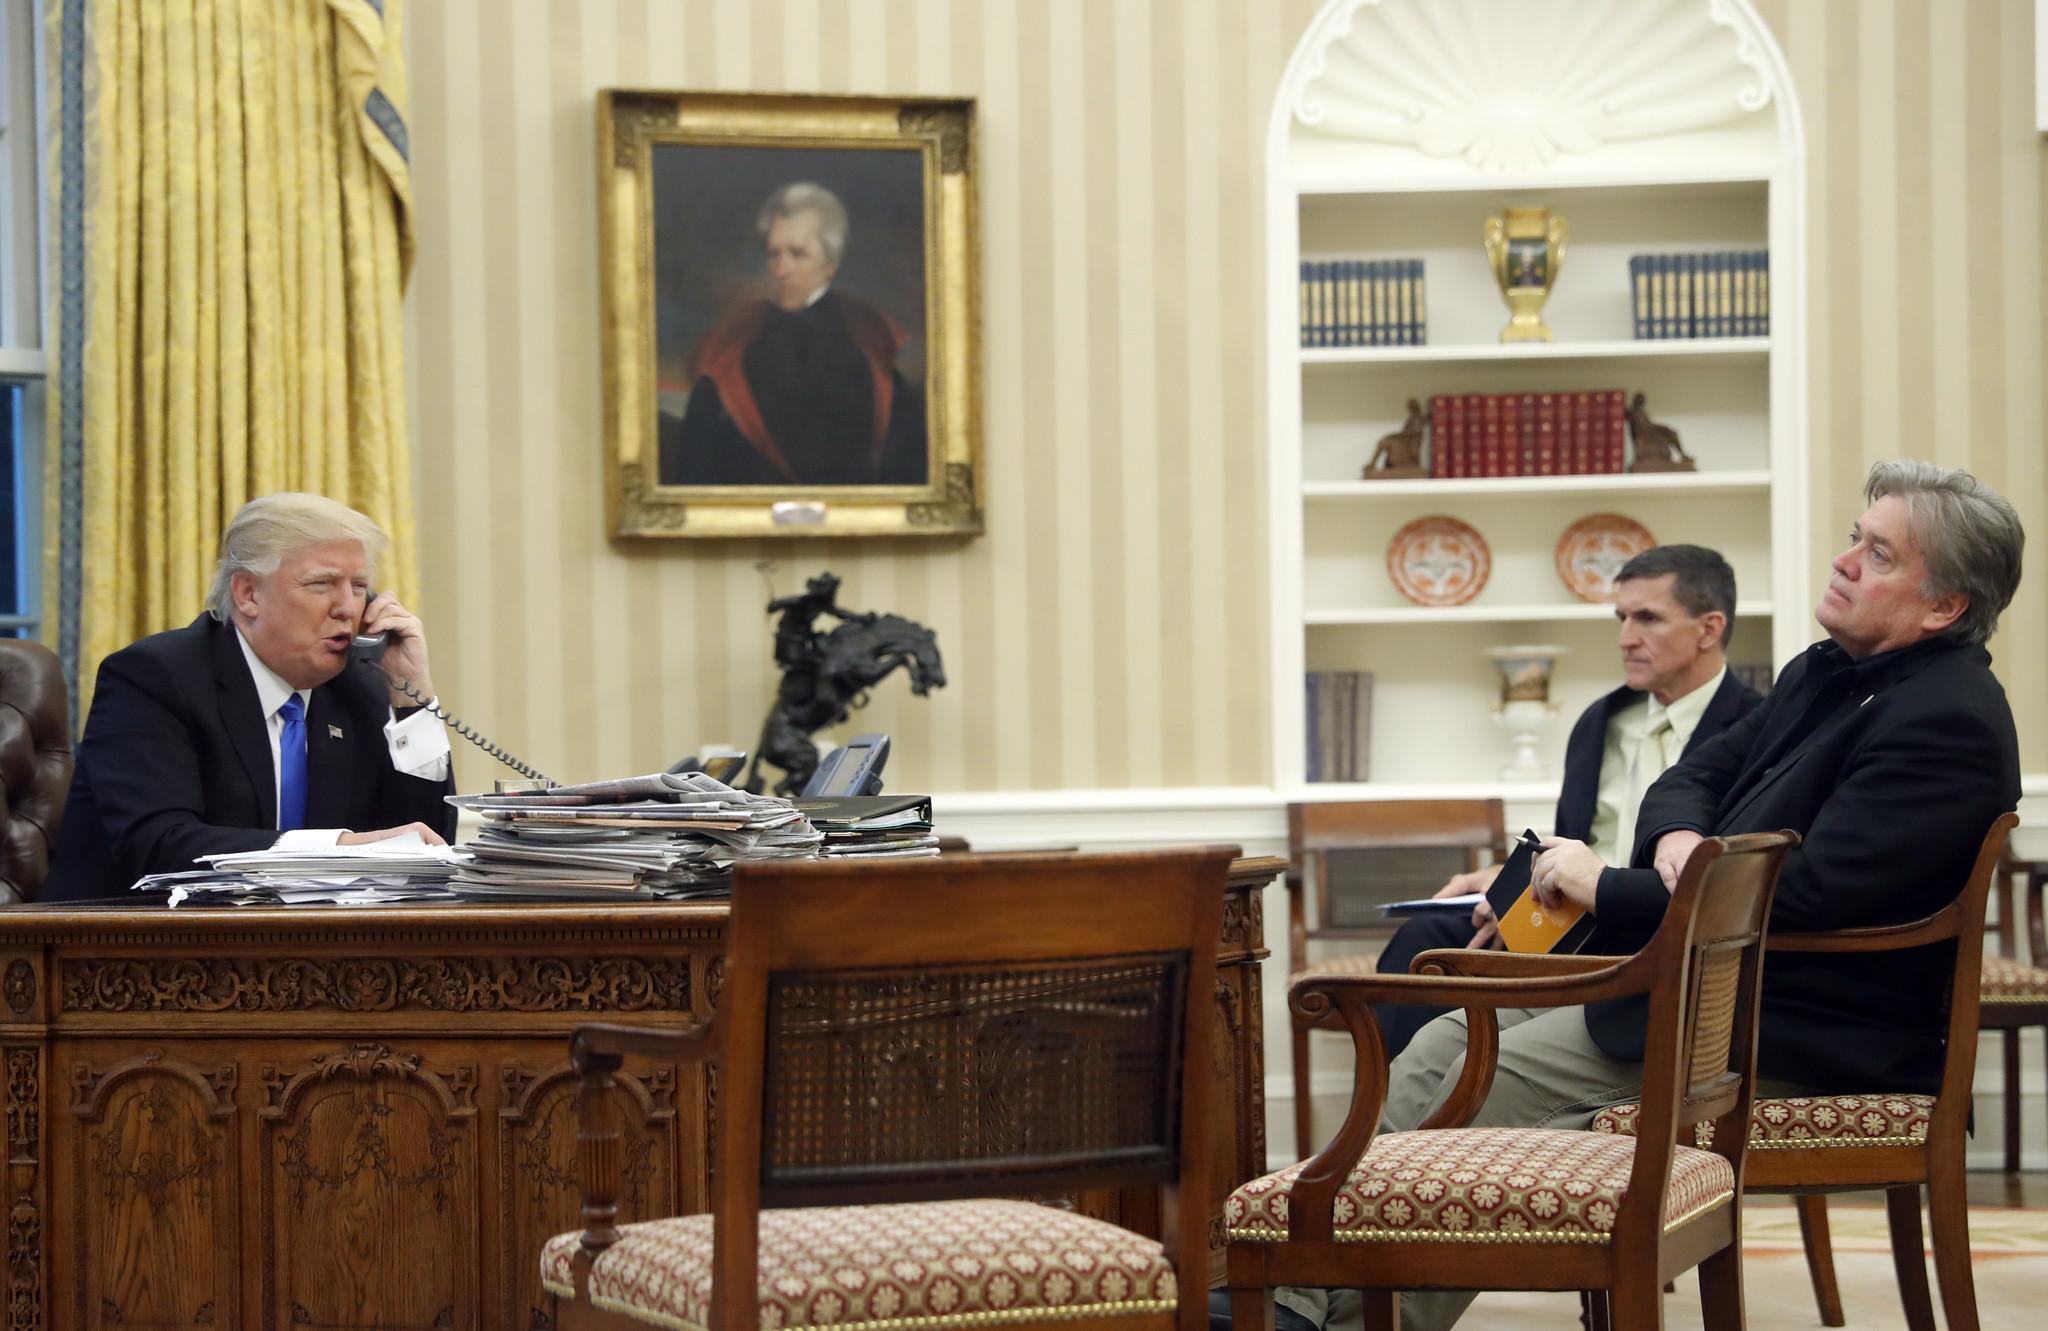 Donald Trump, Michael Flynn, Steve Bannon